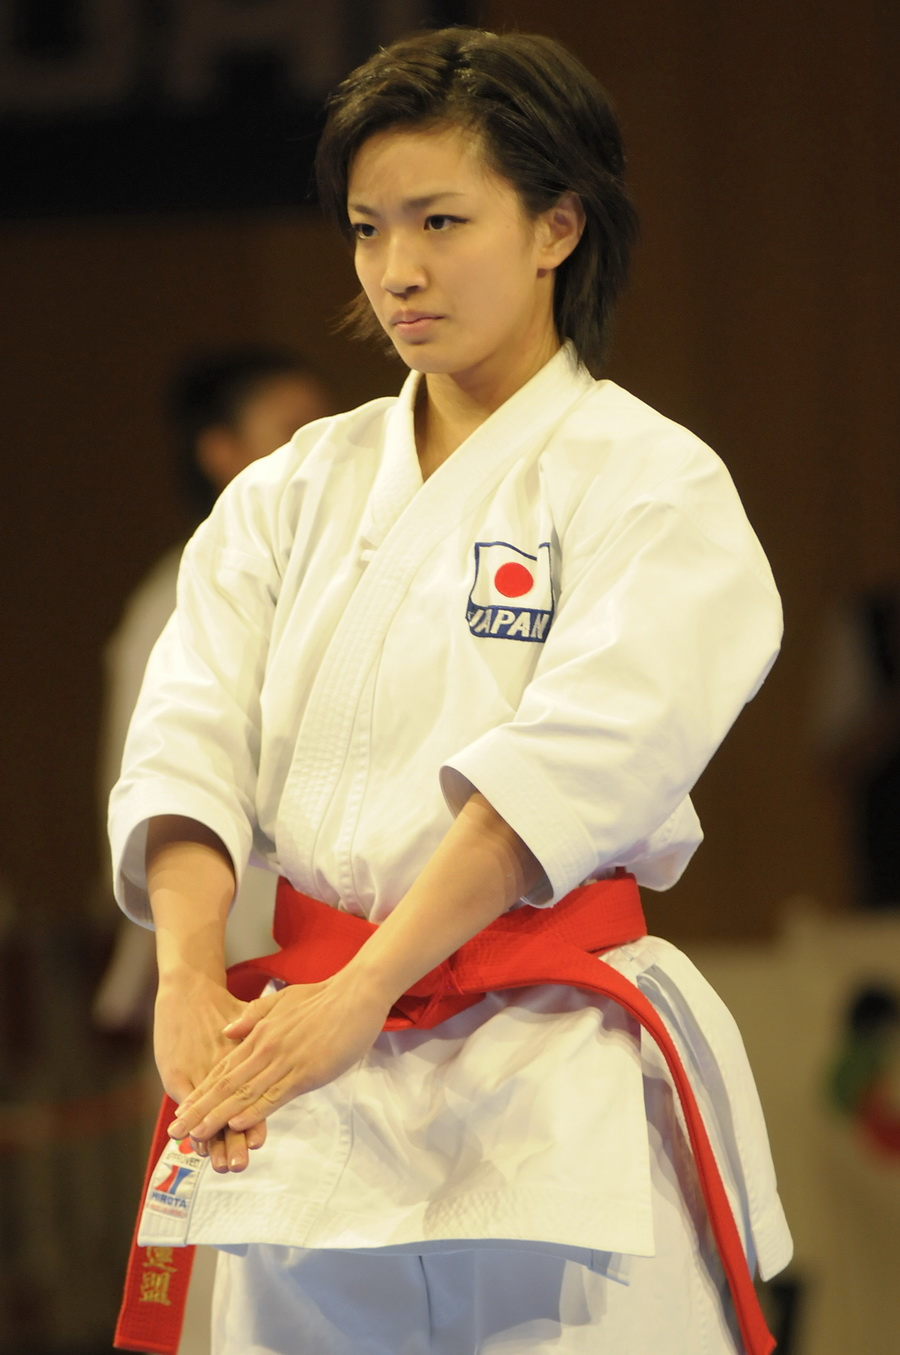 Black Light Wallpaper The Karate Kid Blog Rika Usami Reigning World Champion